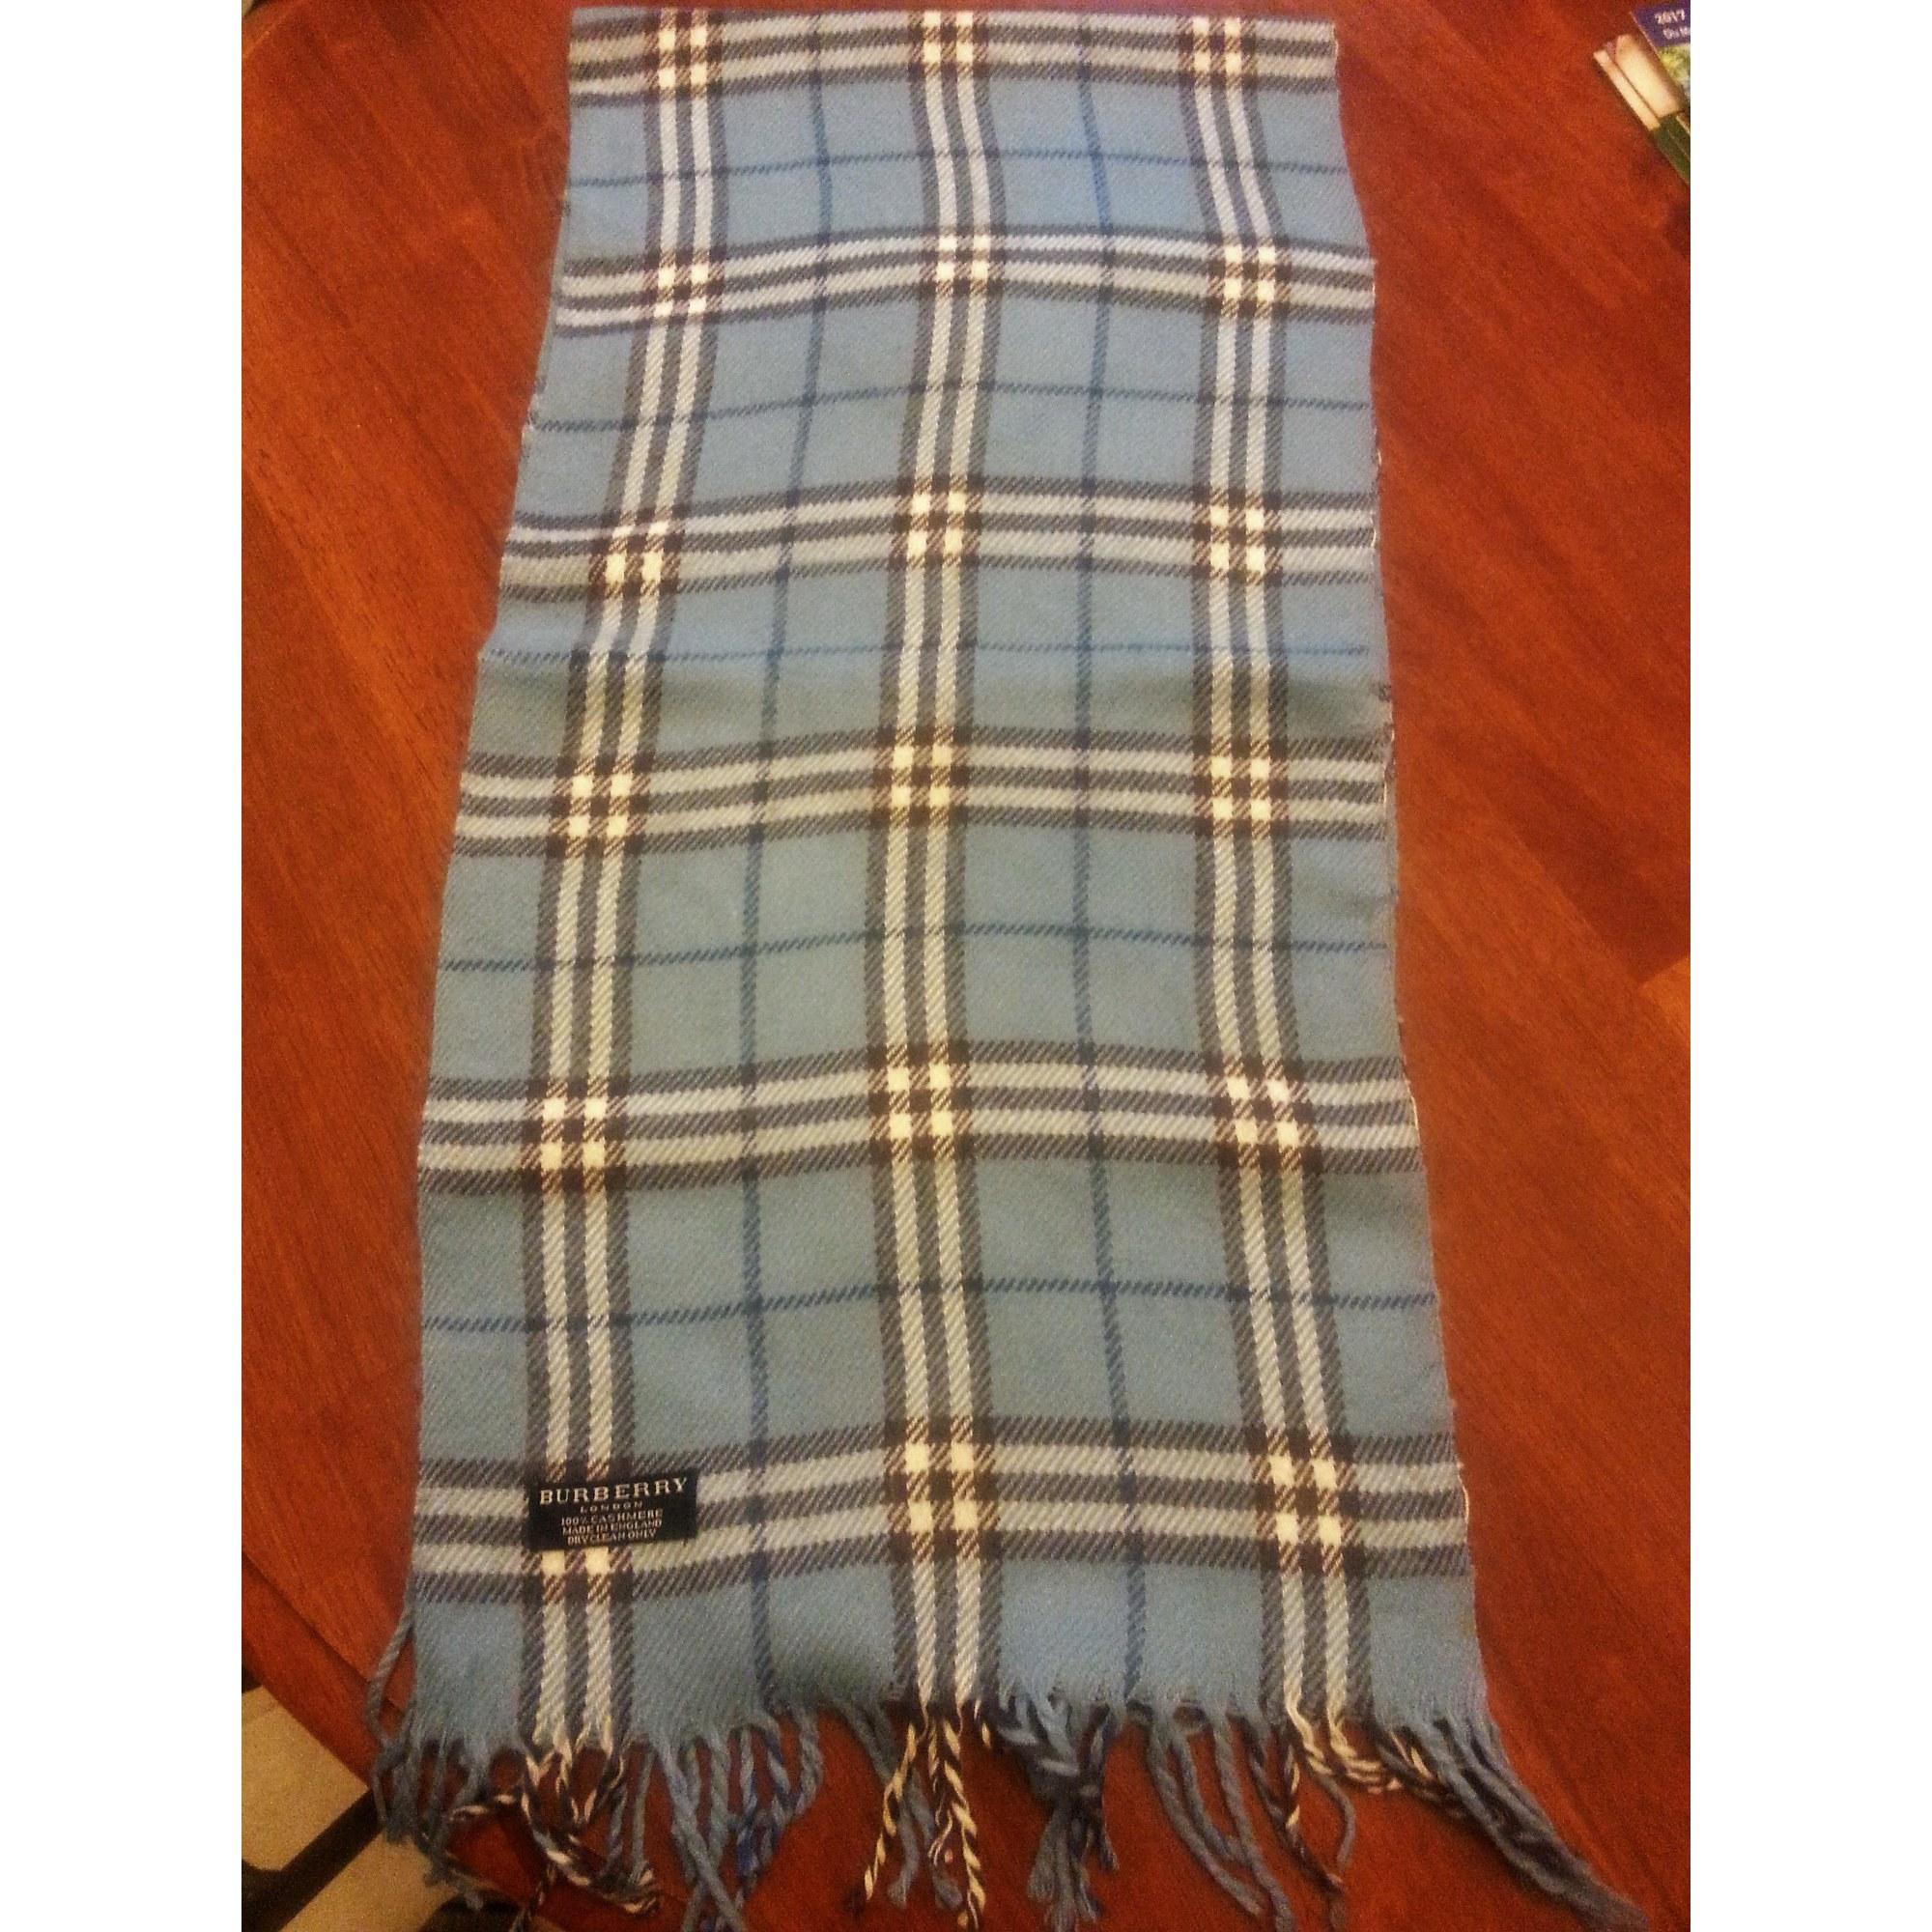 Echarpe BURBERRY bleu vendu par Manialuxe - 7275396 ba1c3fdd88e